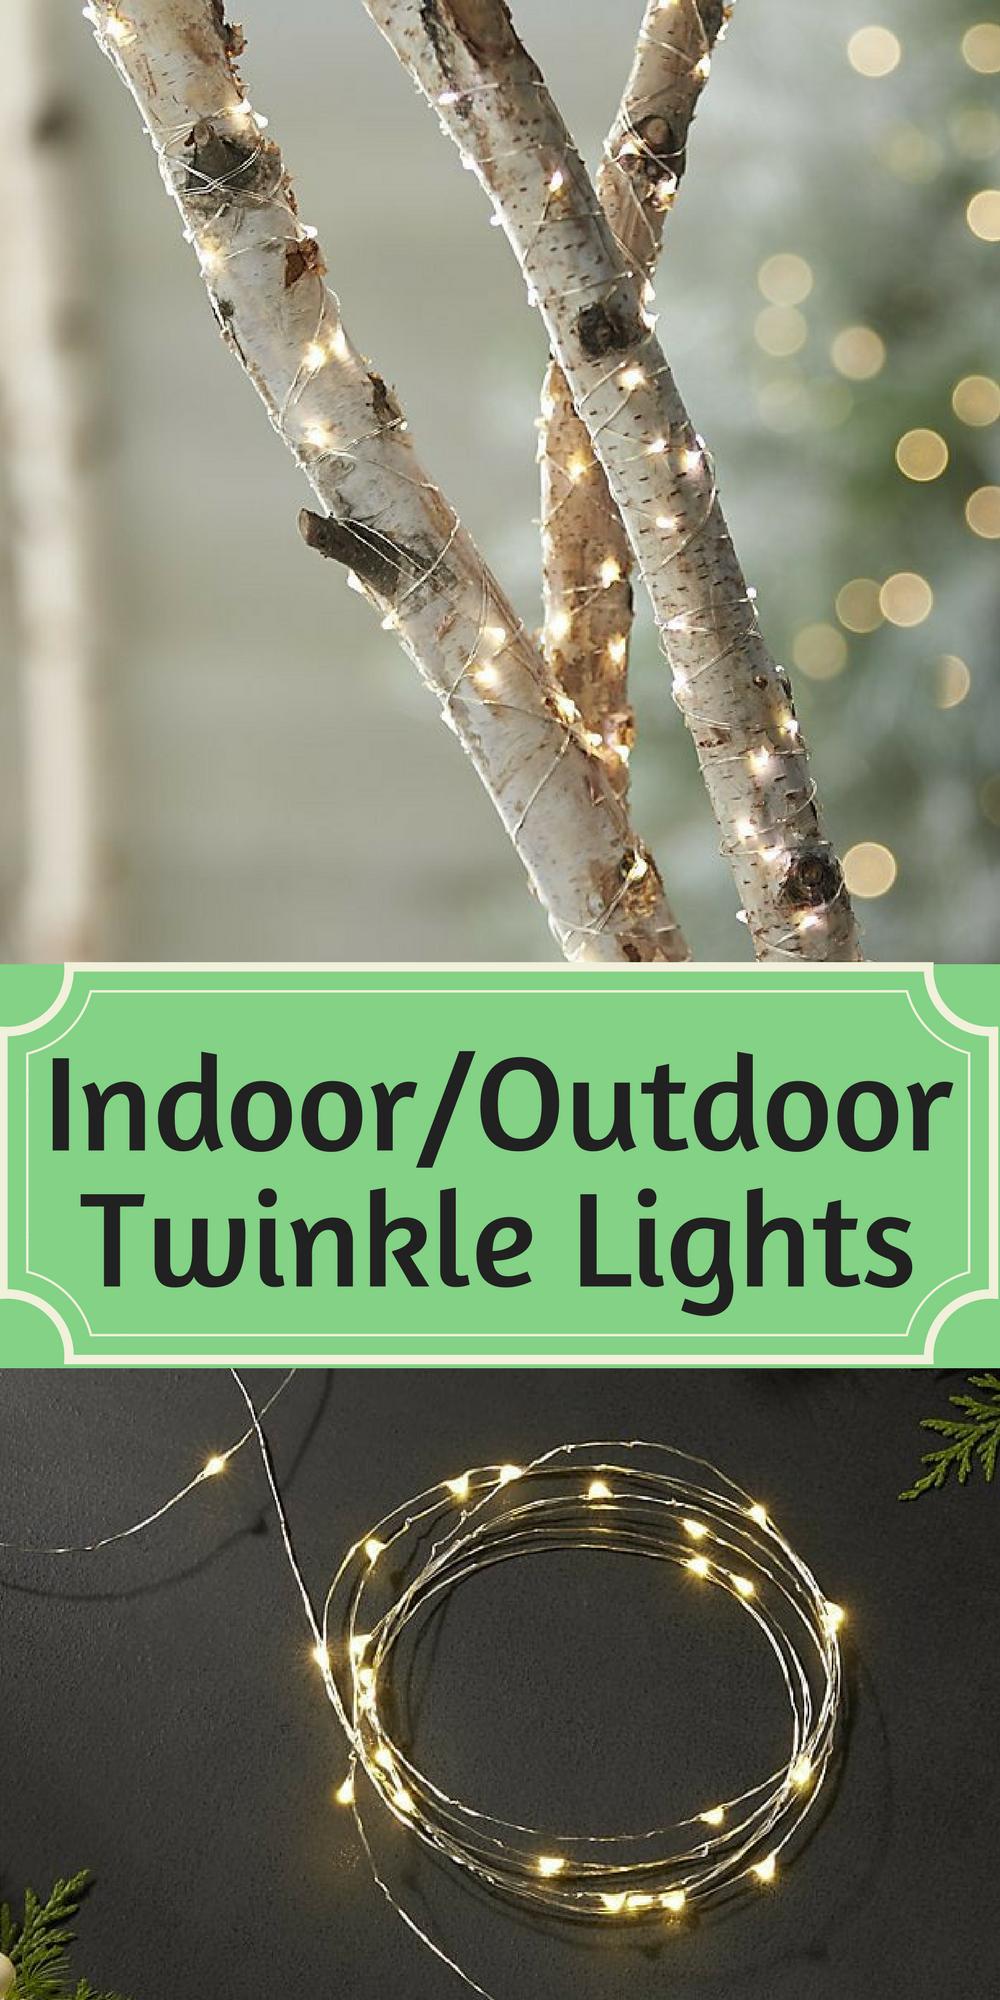 Indoor outdoor twinkle lights tiny twinkling lights on a slender indoor outdoor twinkle lights tiny twinkling lights on a slender silver wire wrap trees workwithnaturefo